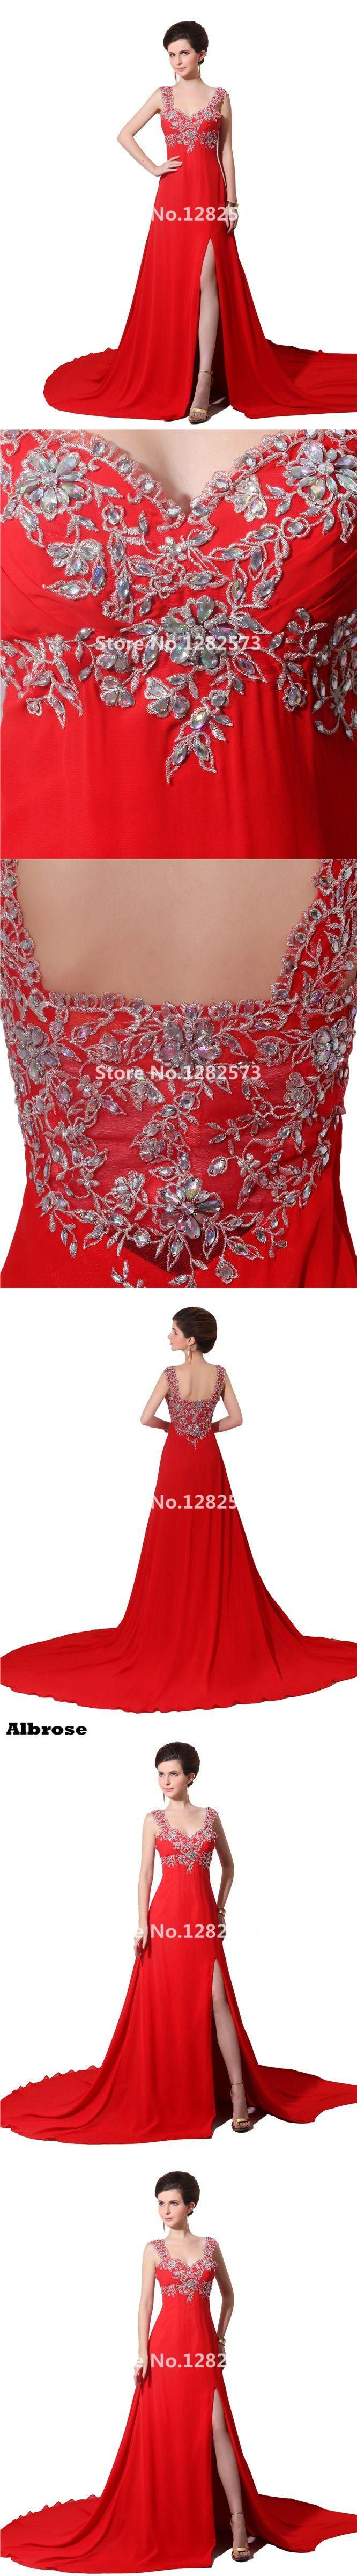 Red Chiffon Sexy Beach Evening Dress 2017 Rhinestone Evening Dresses Long Party Gown vestido de noche Chic robe de soiree